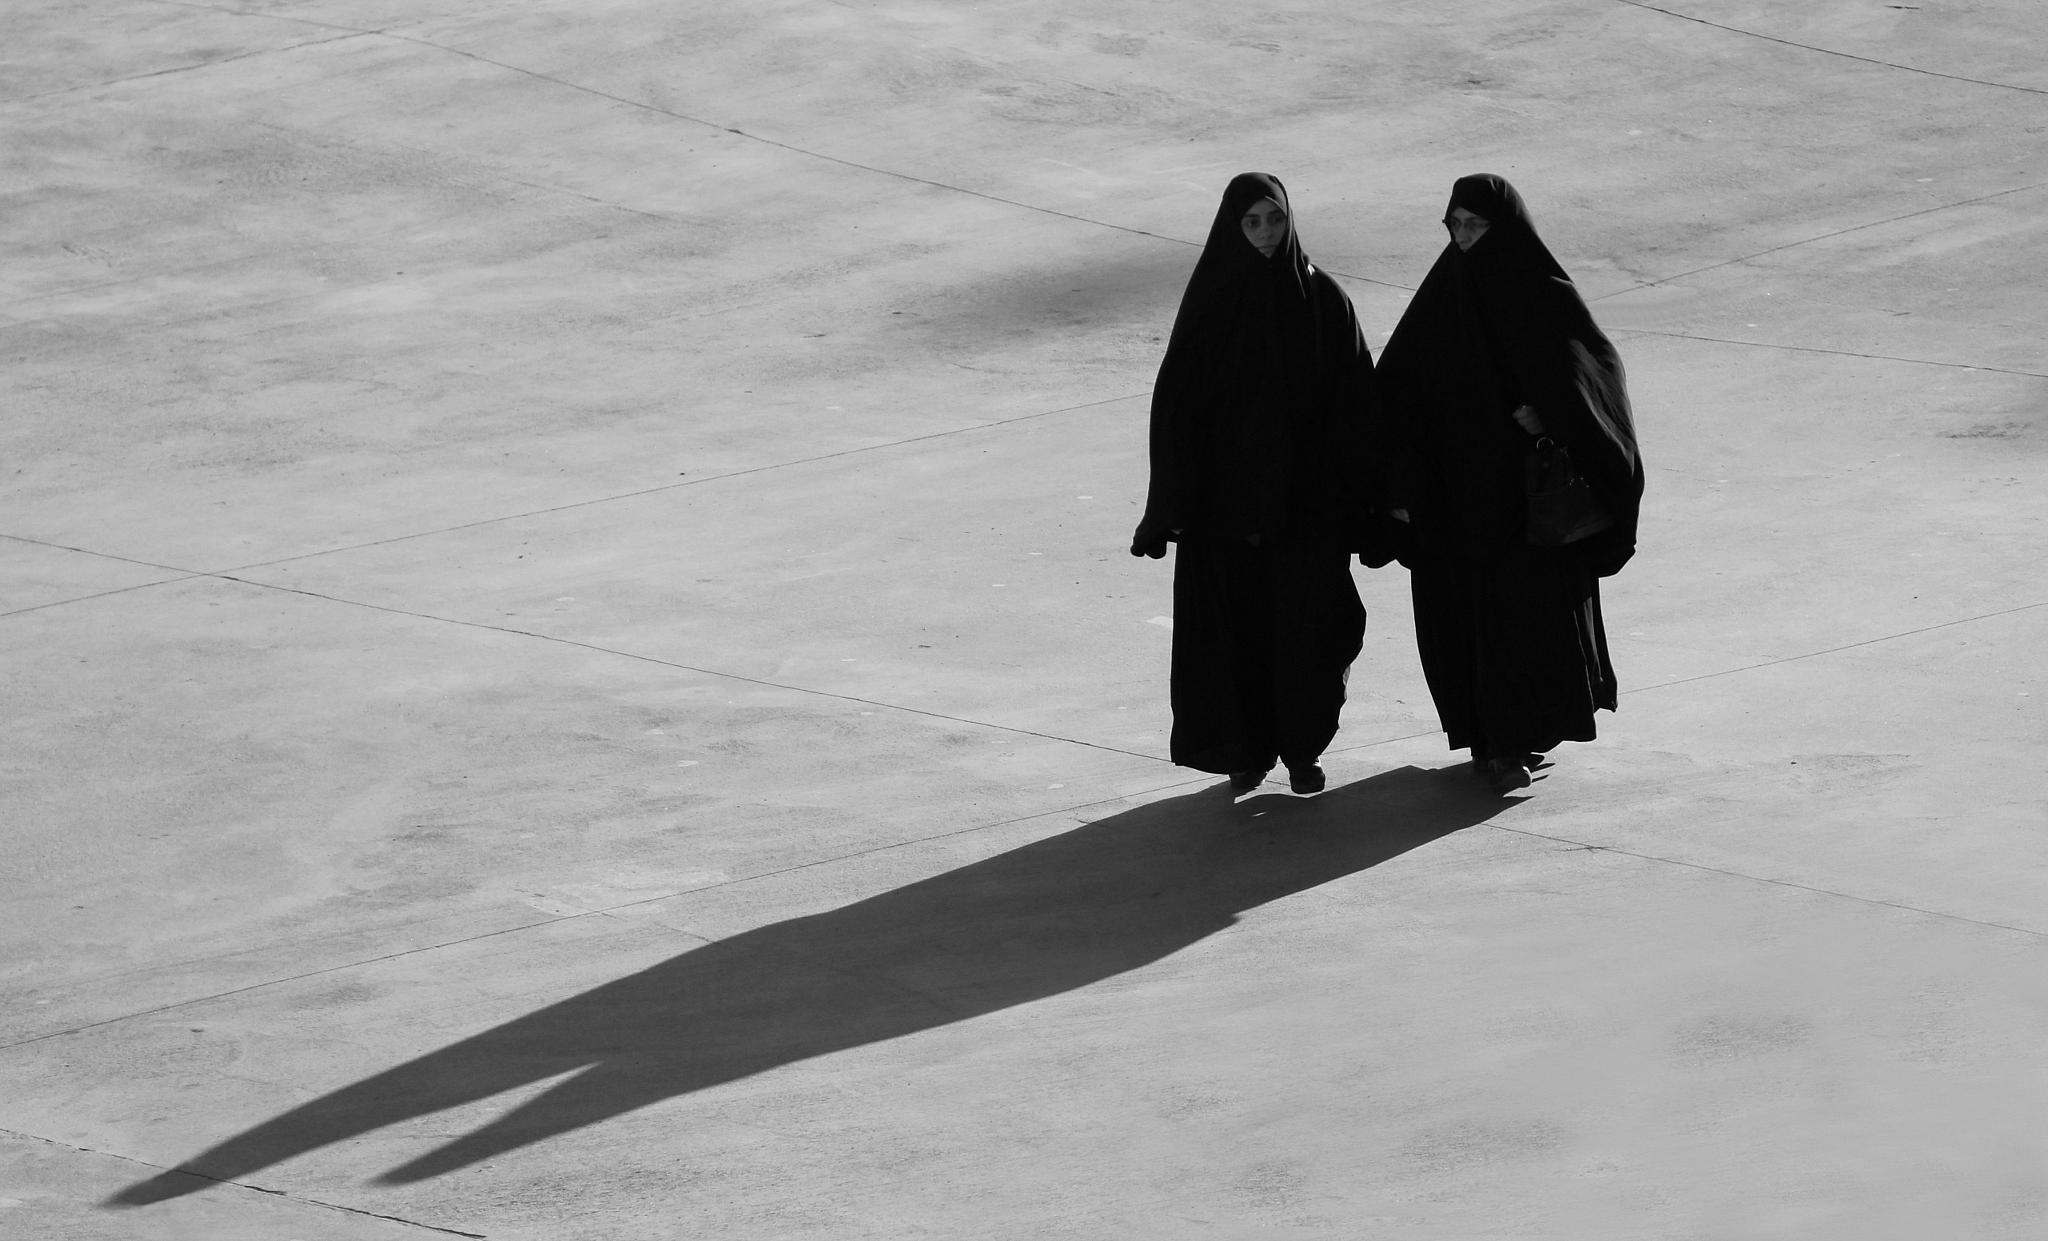 Untitled by Abdullah Durmuş